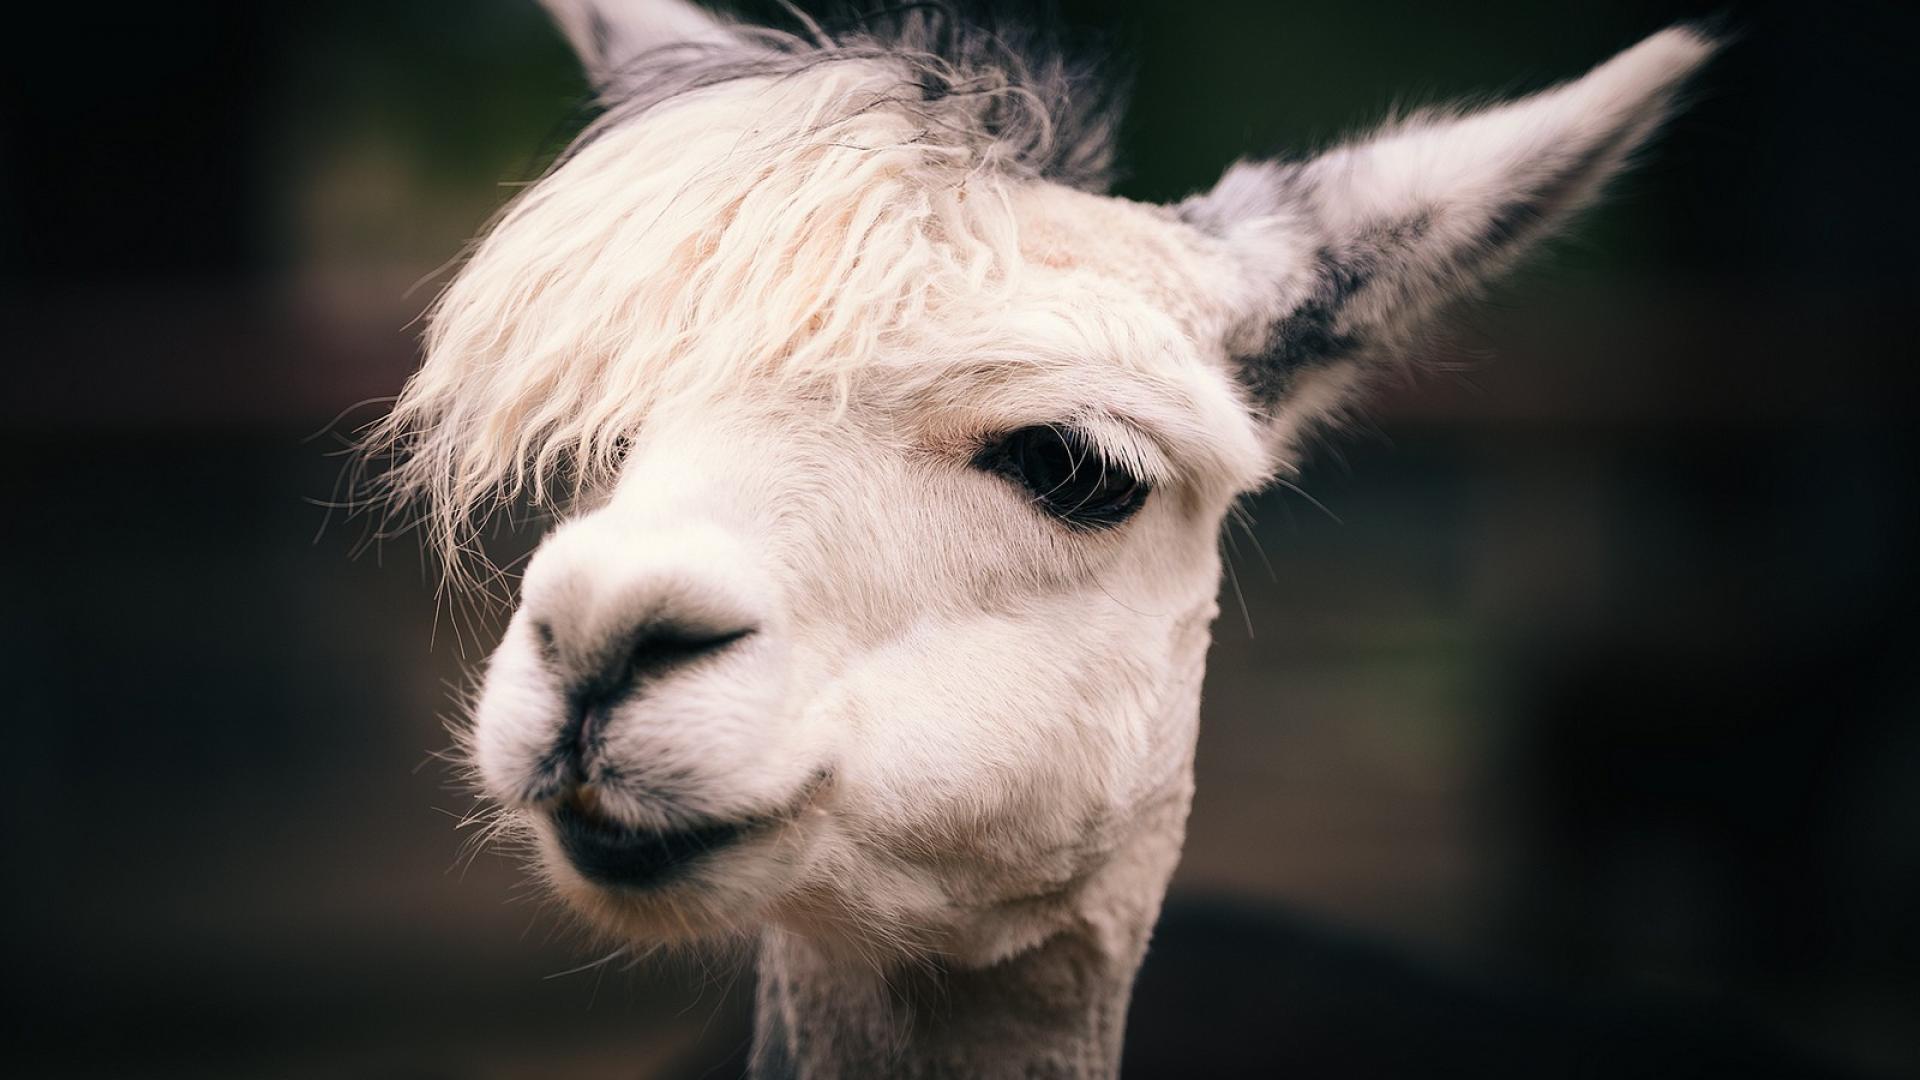 Animals llama wallpaper 79175 1920x1080